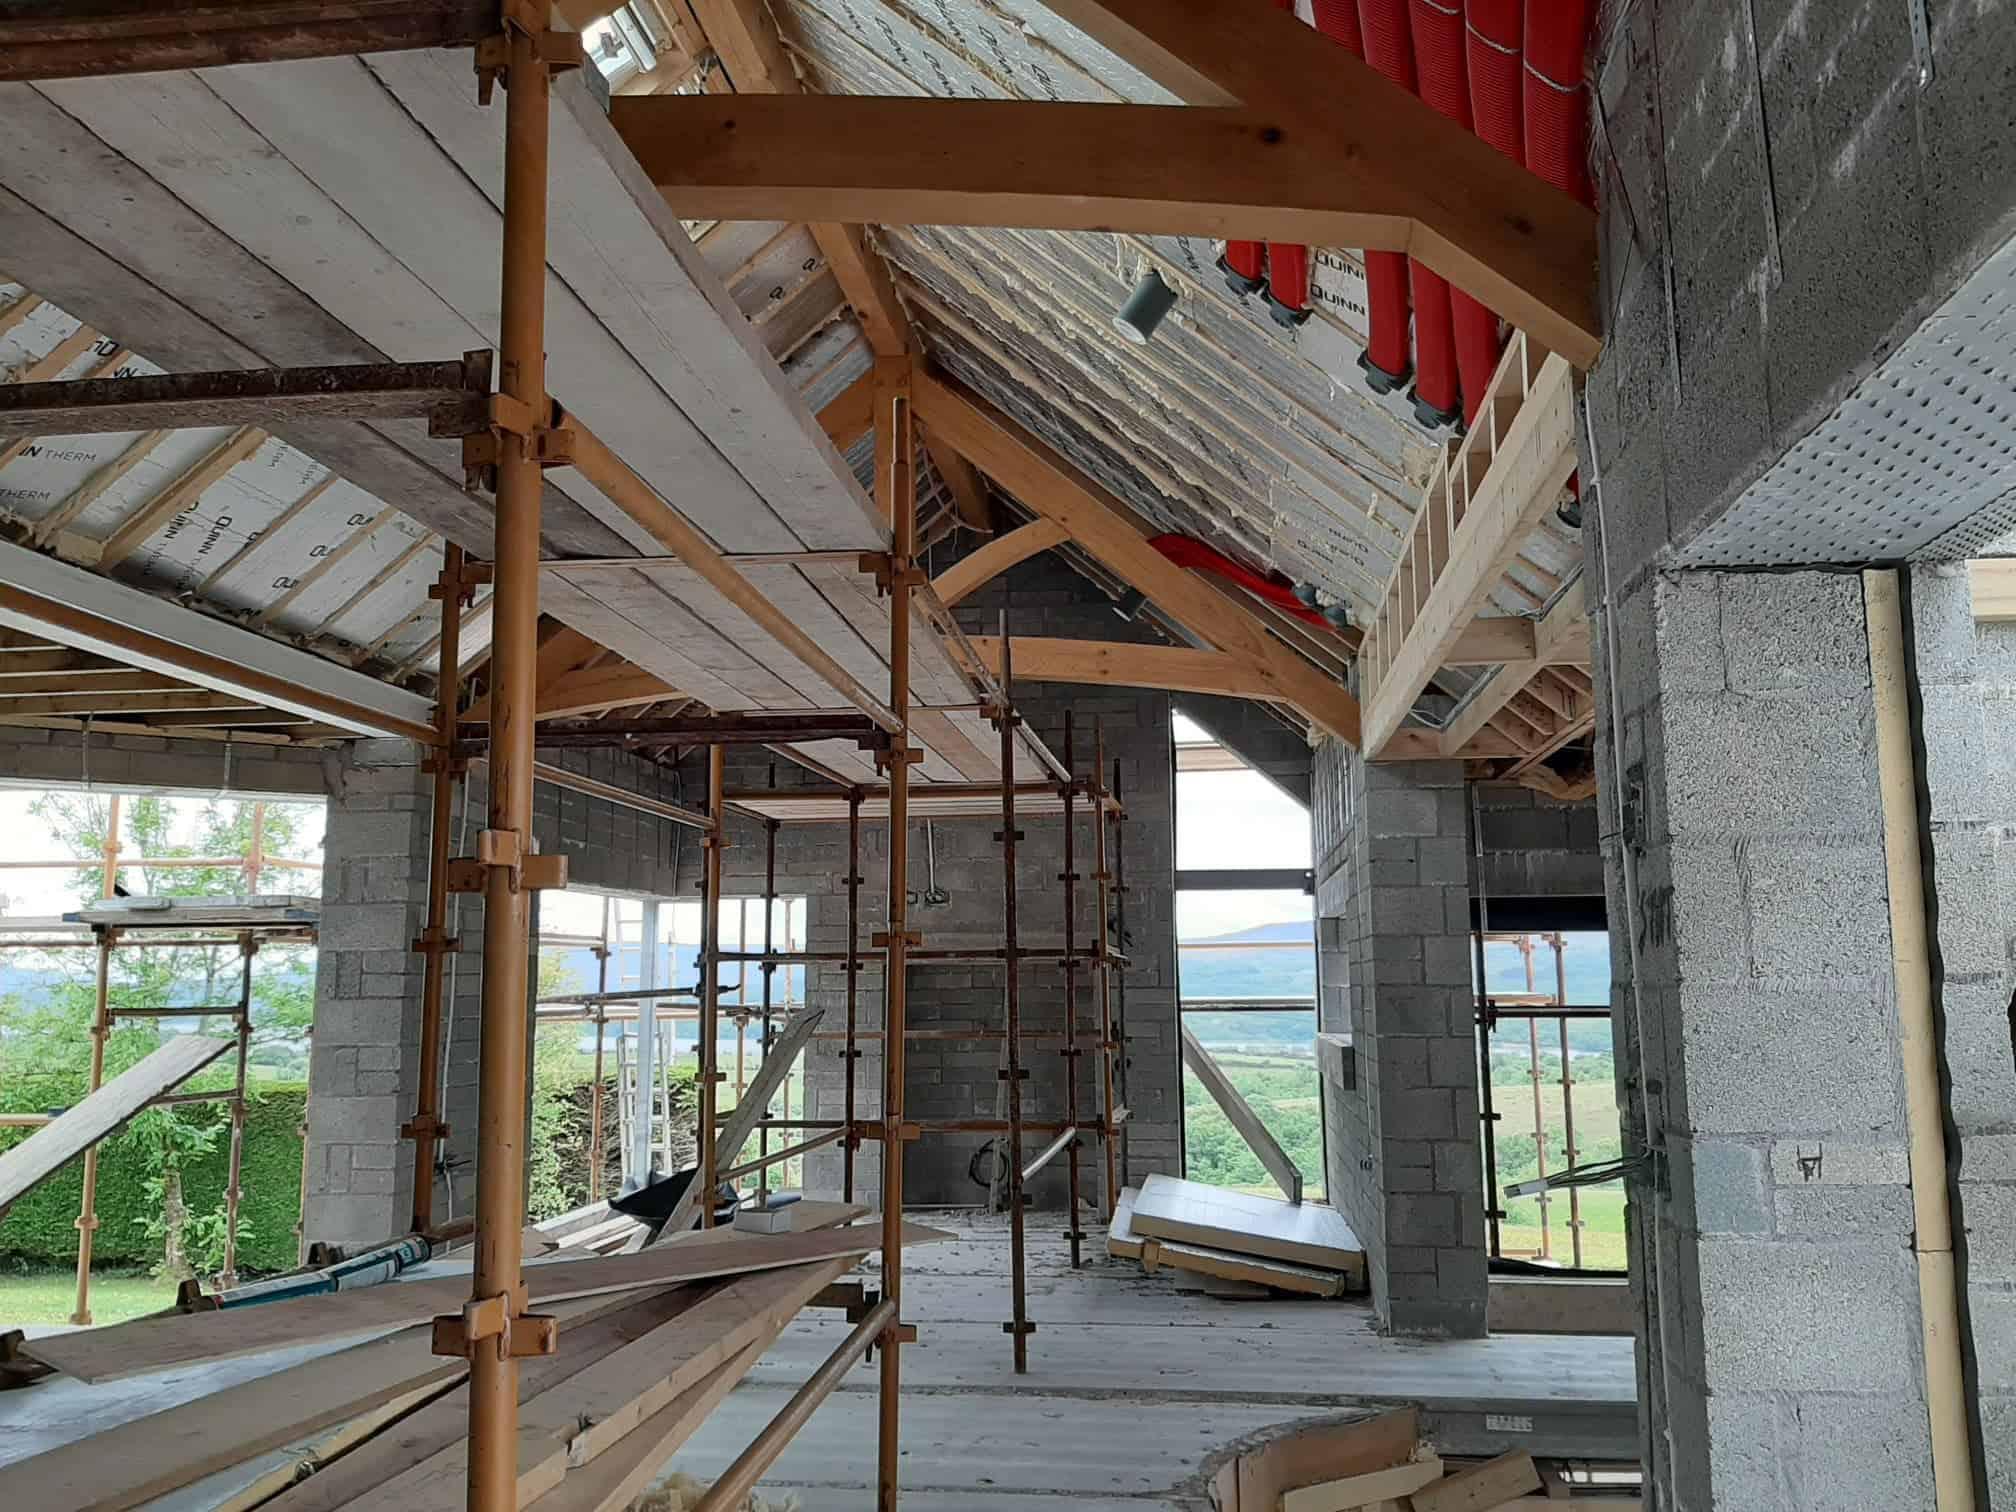 Mc Govern Dwelling - Under Construction